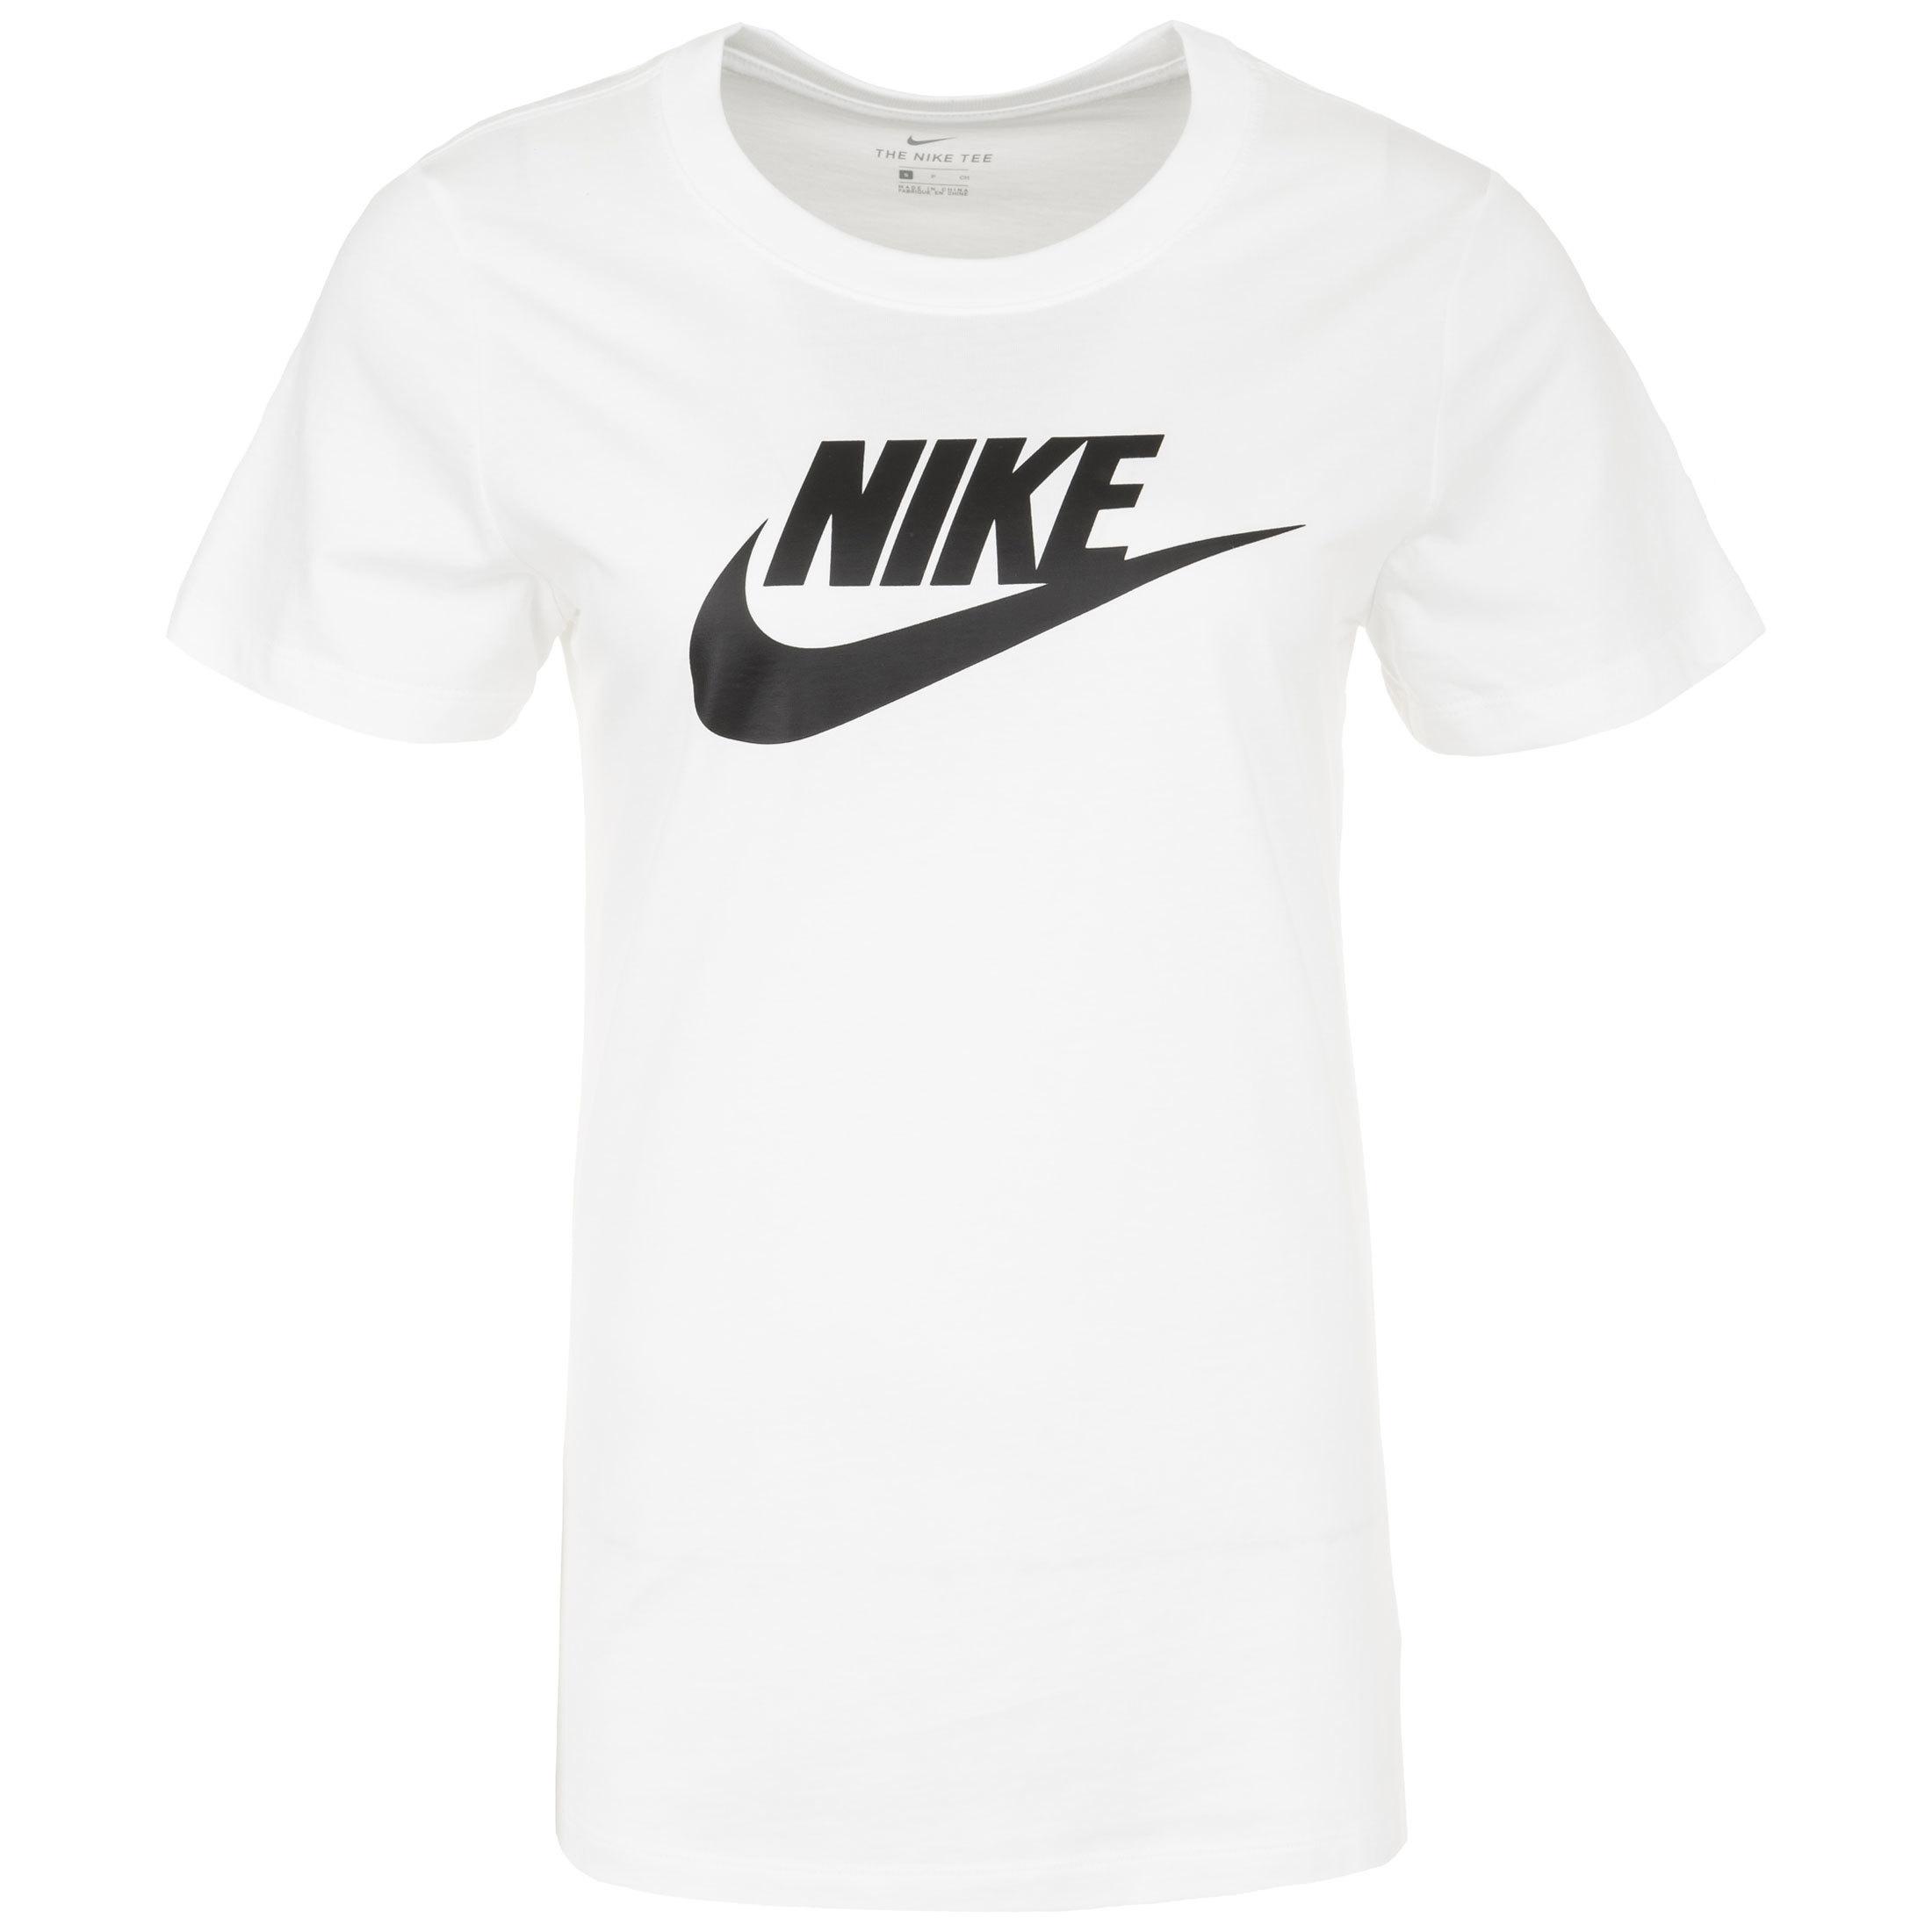 Nike Sportswear Essential T Shirt White Bv6169 100 Footy Com